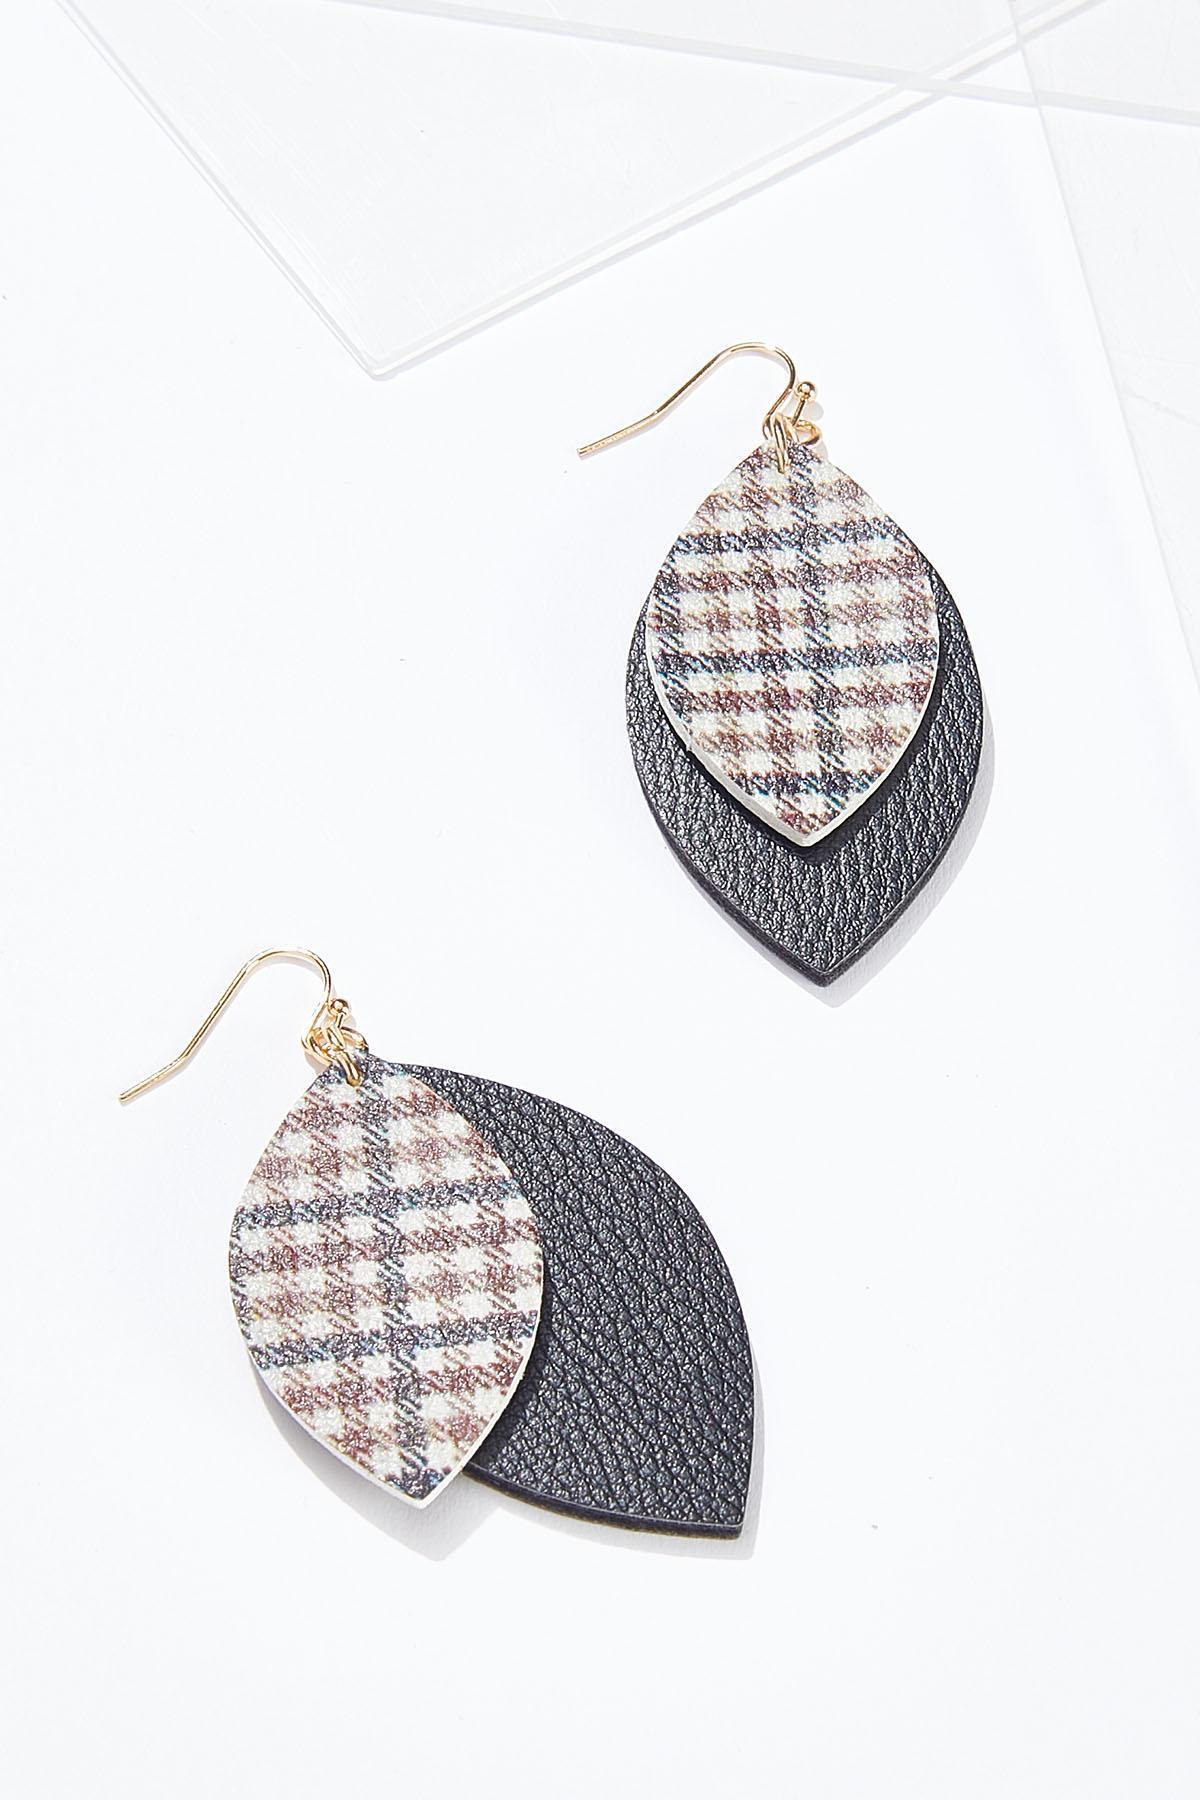 Plaid Faux Leather Earrings